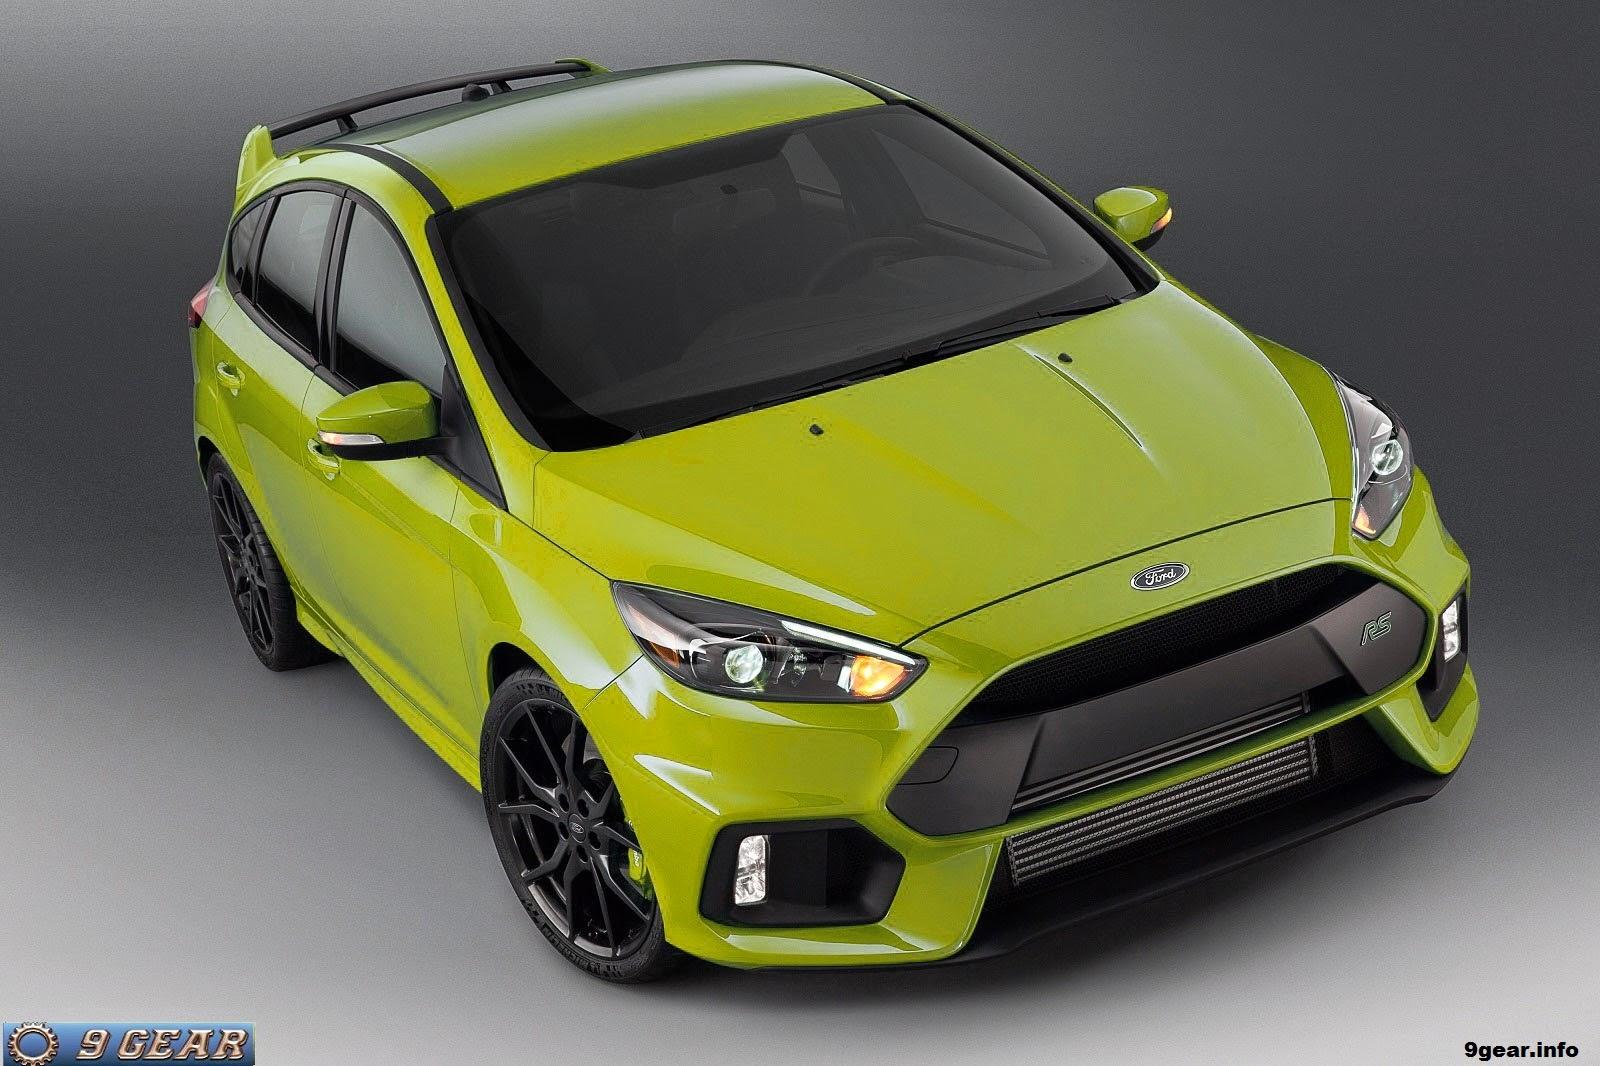 2016 ford focus rs 2 3 liter 315 horsepower car reviews new car pictures for 2018 2019. Black Bedroom Furniture Sets. Home Design Ideas